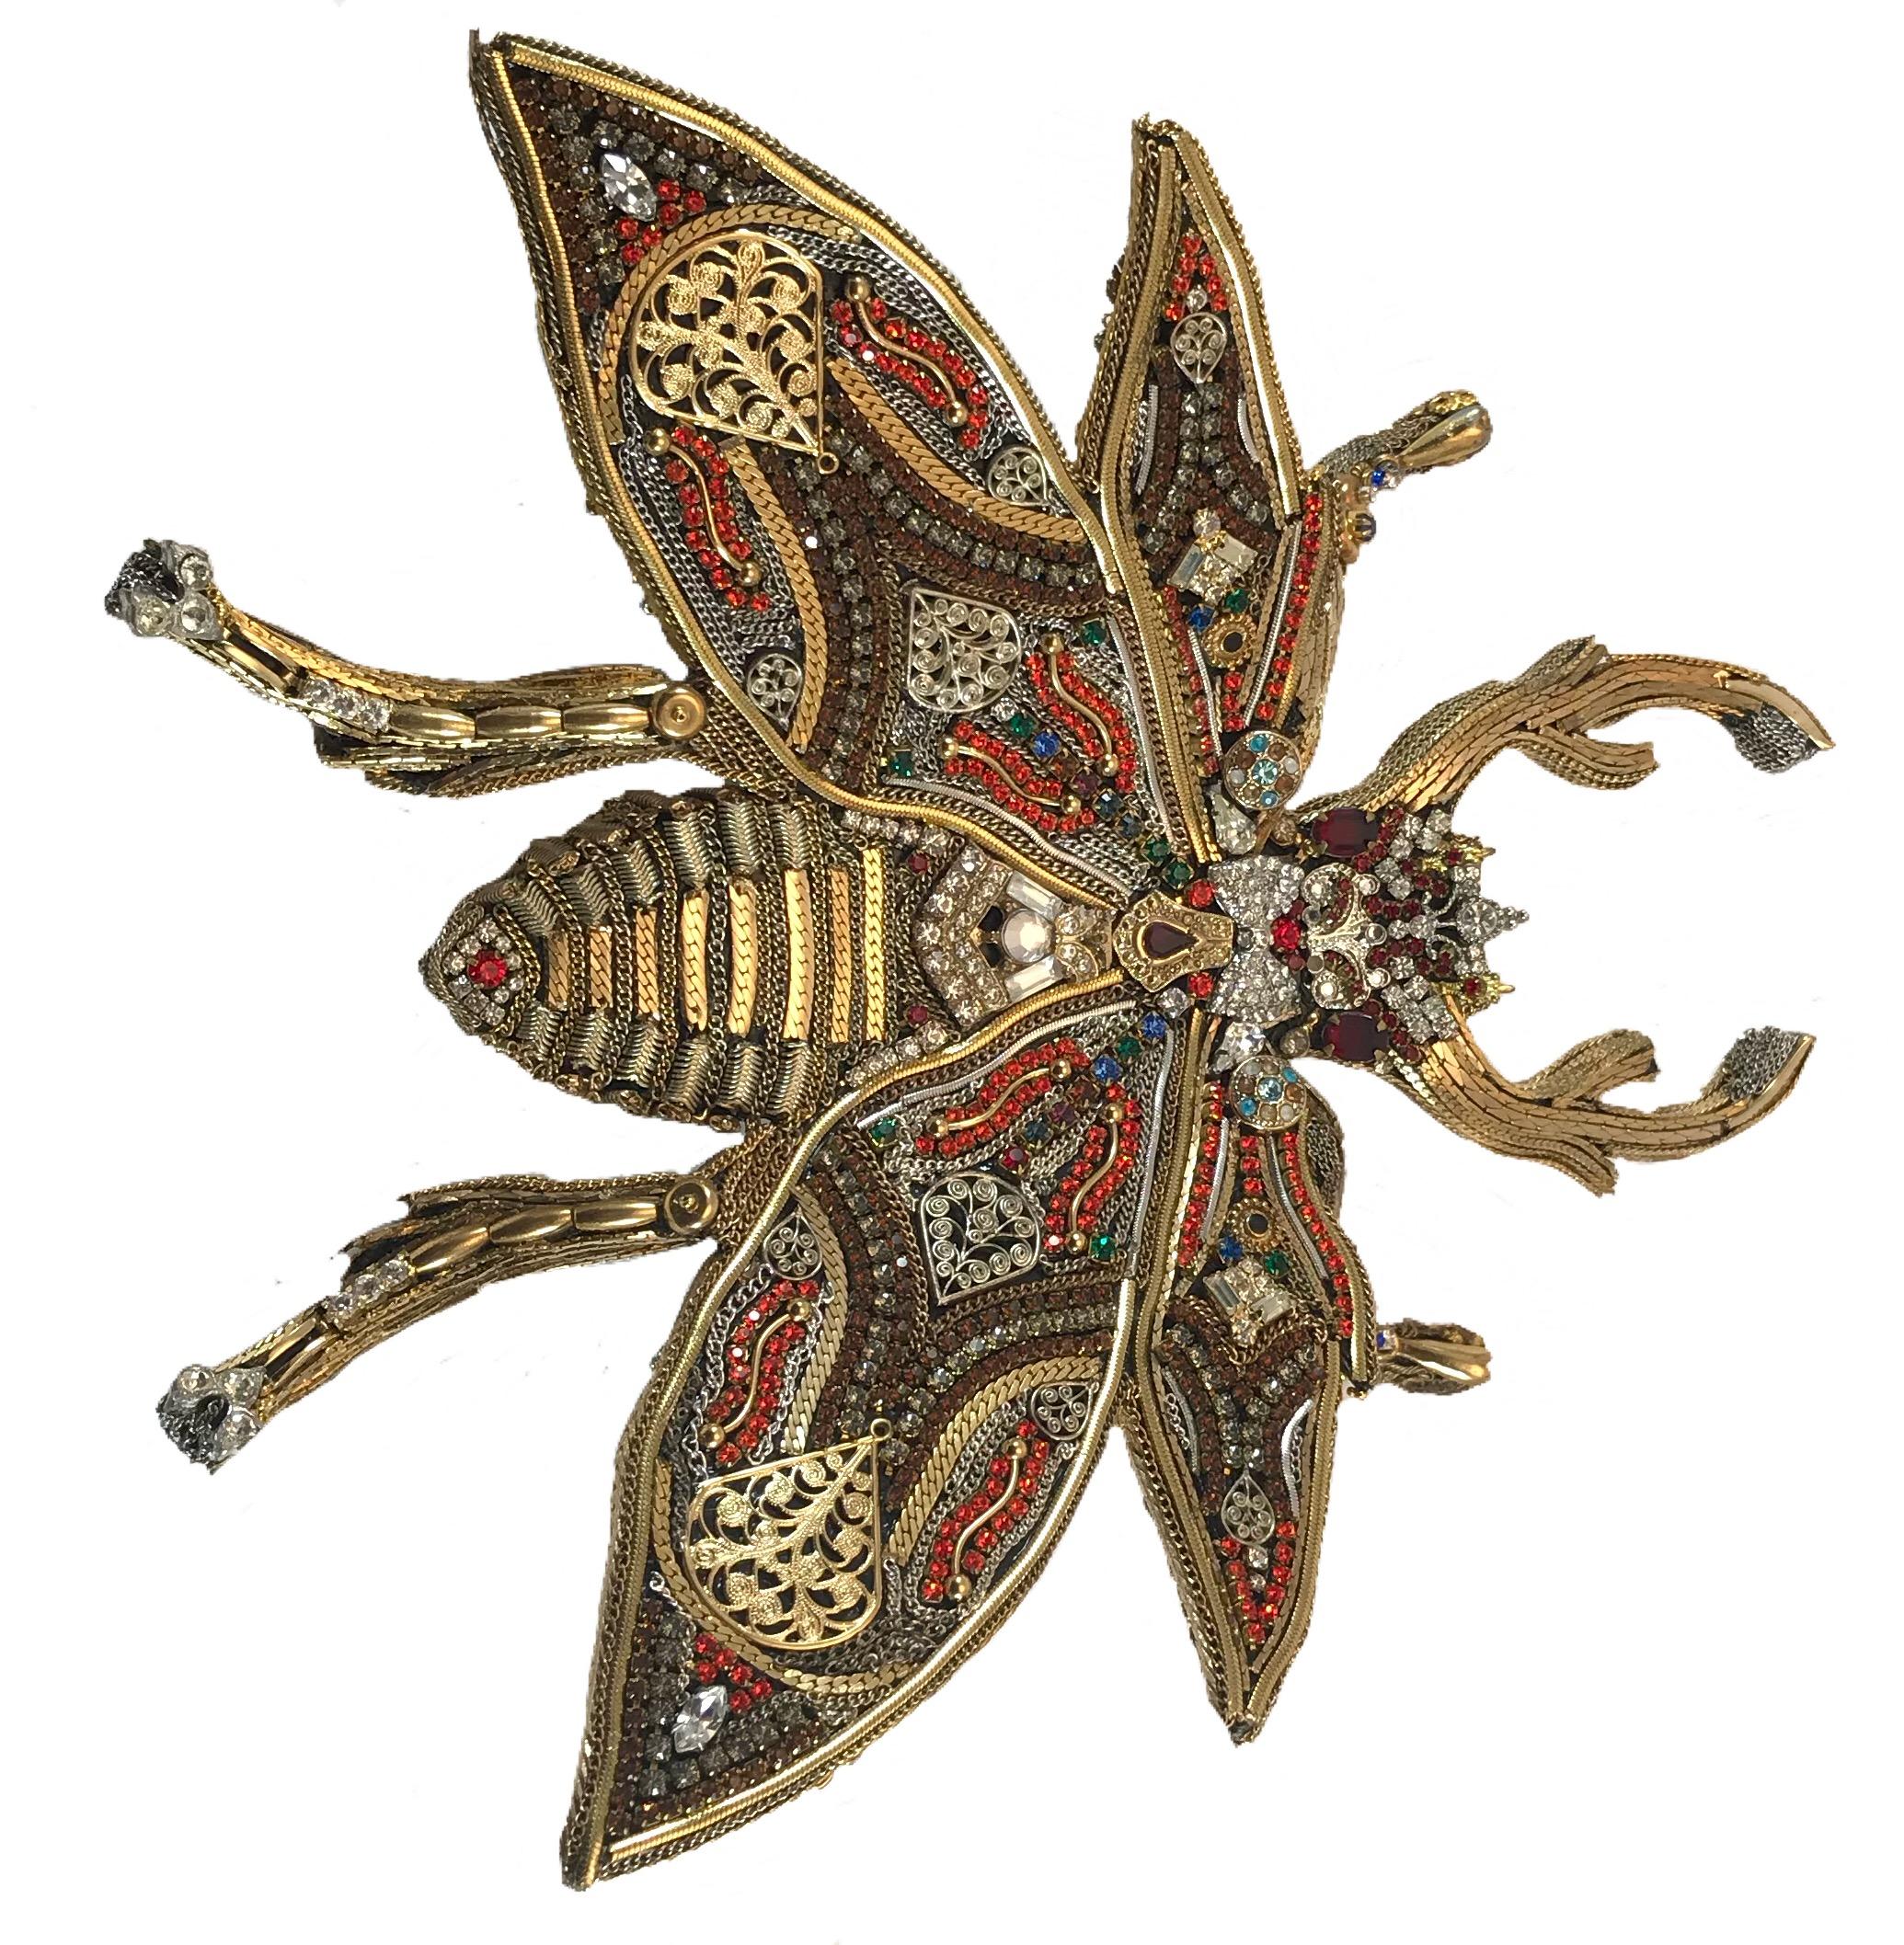 Jeweled Stag Beetle